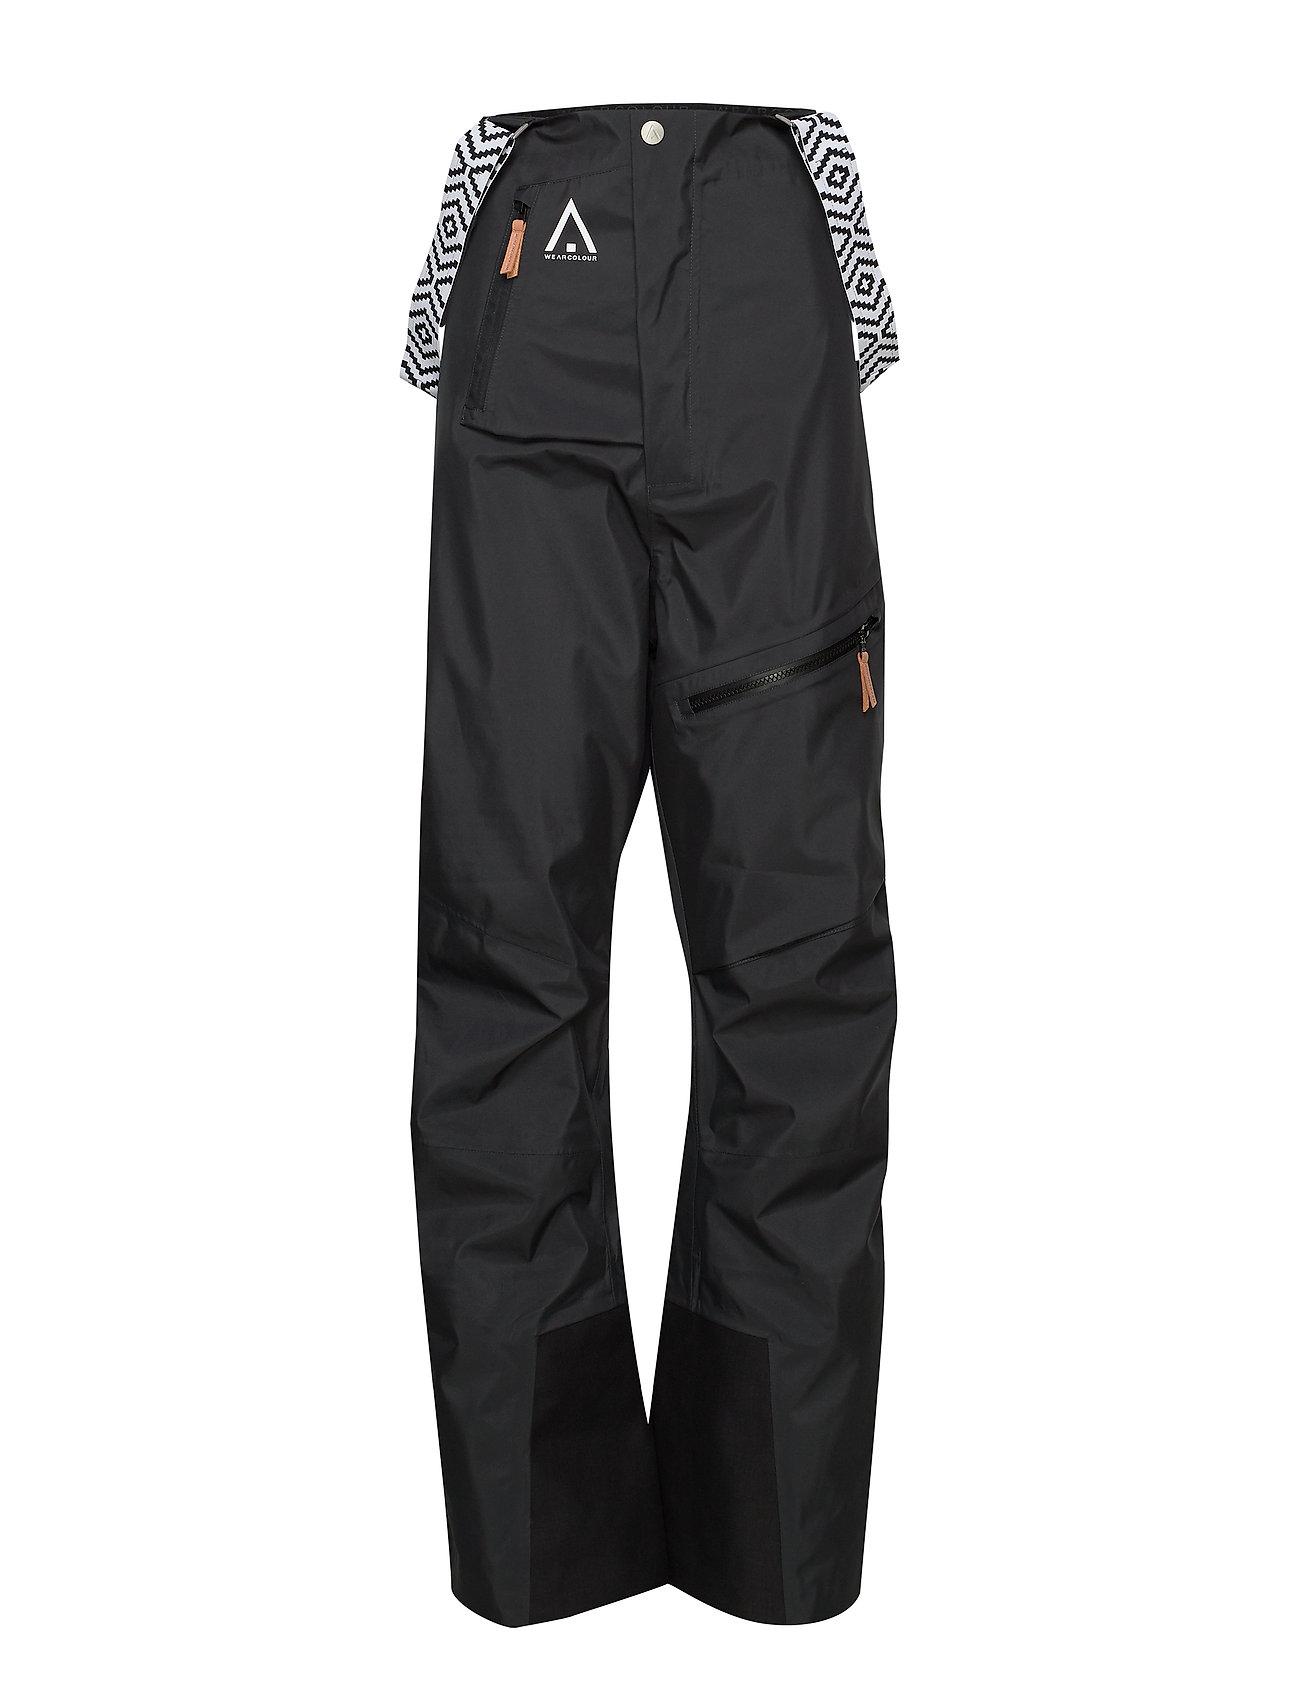 Image of Owl Pant Sport Pants Sort WearColour (3280631689)